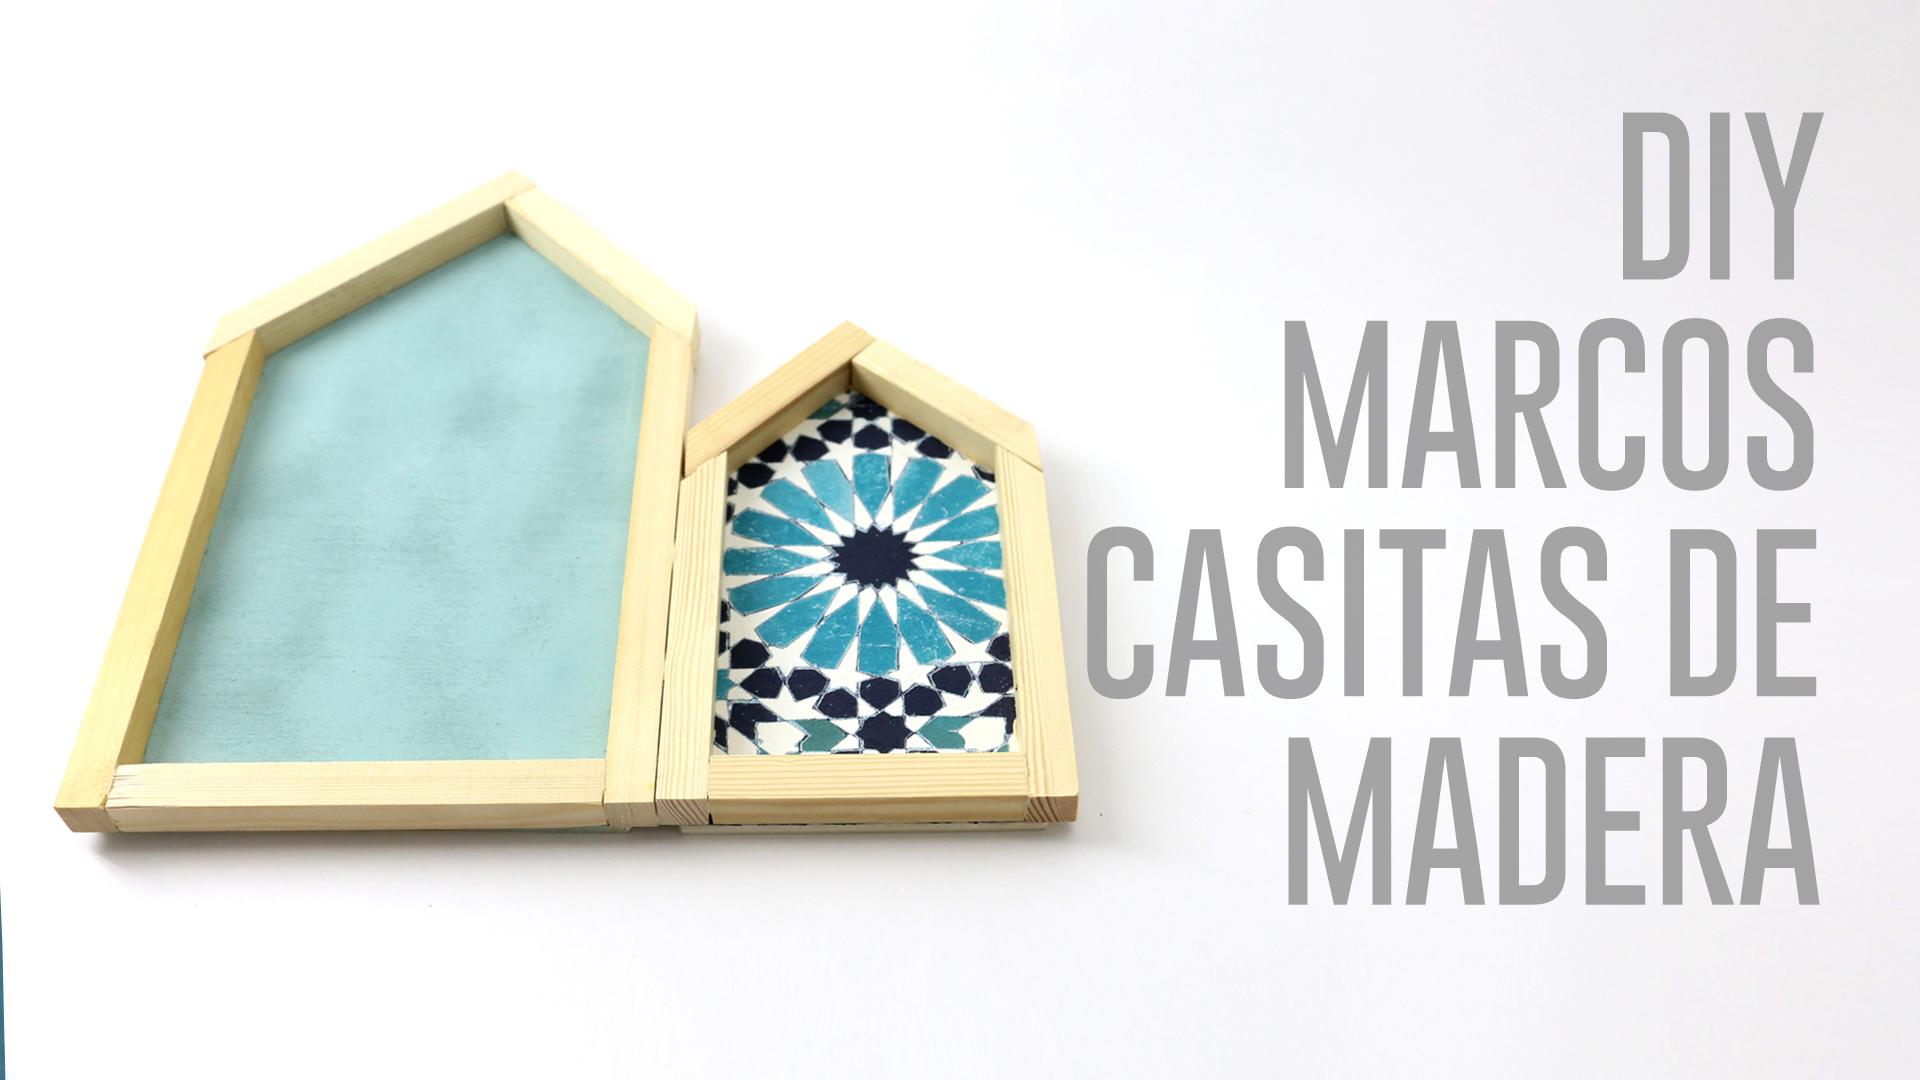 DIY_MARCOS CASITAS DE MADERA_CEYS.Imagen fija002